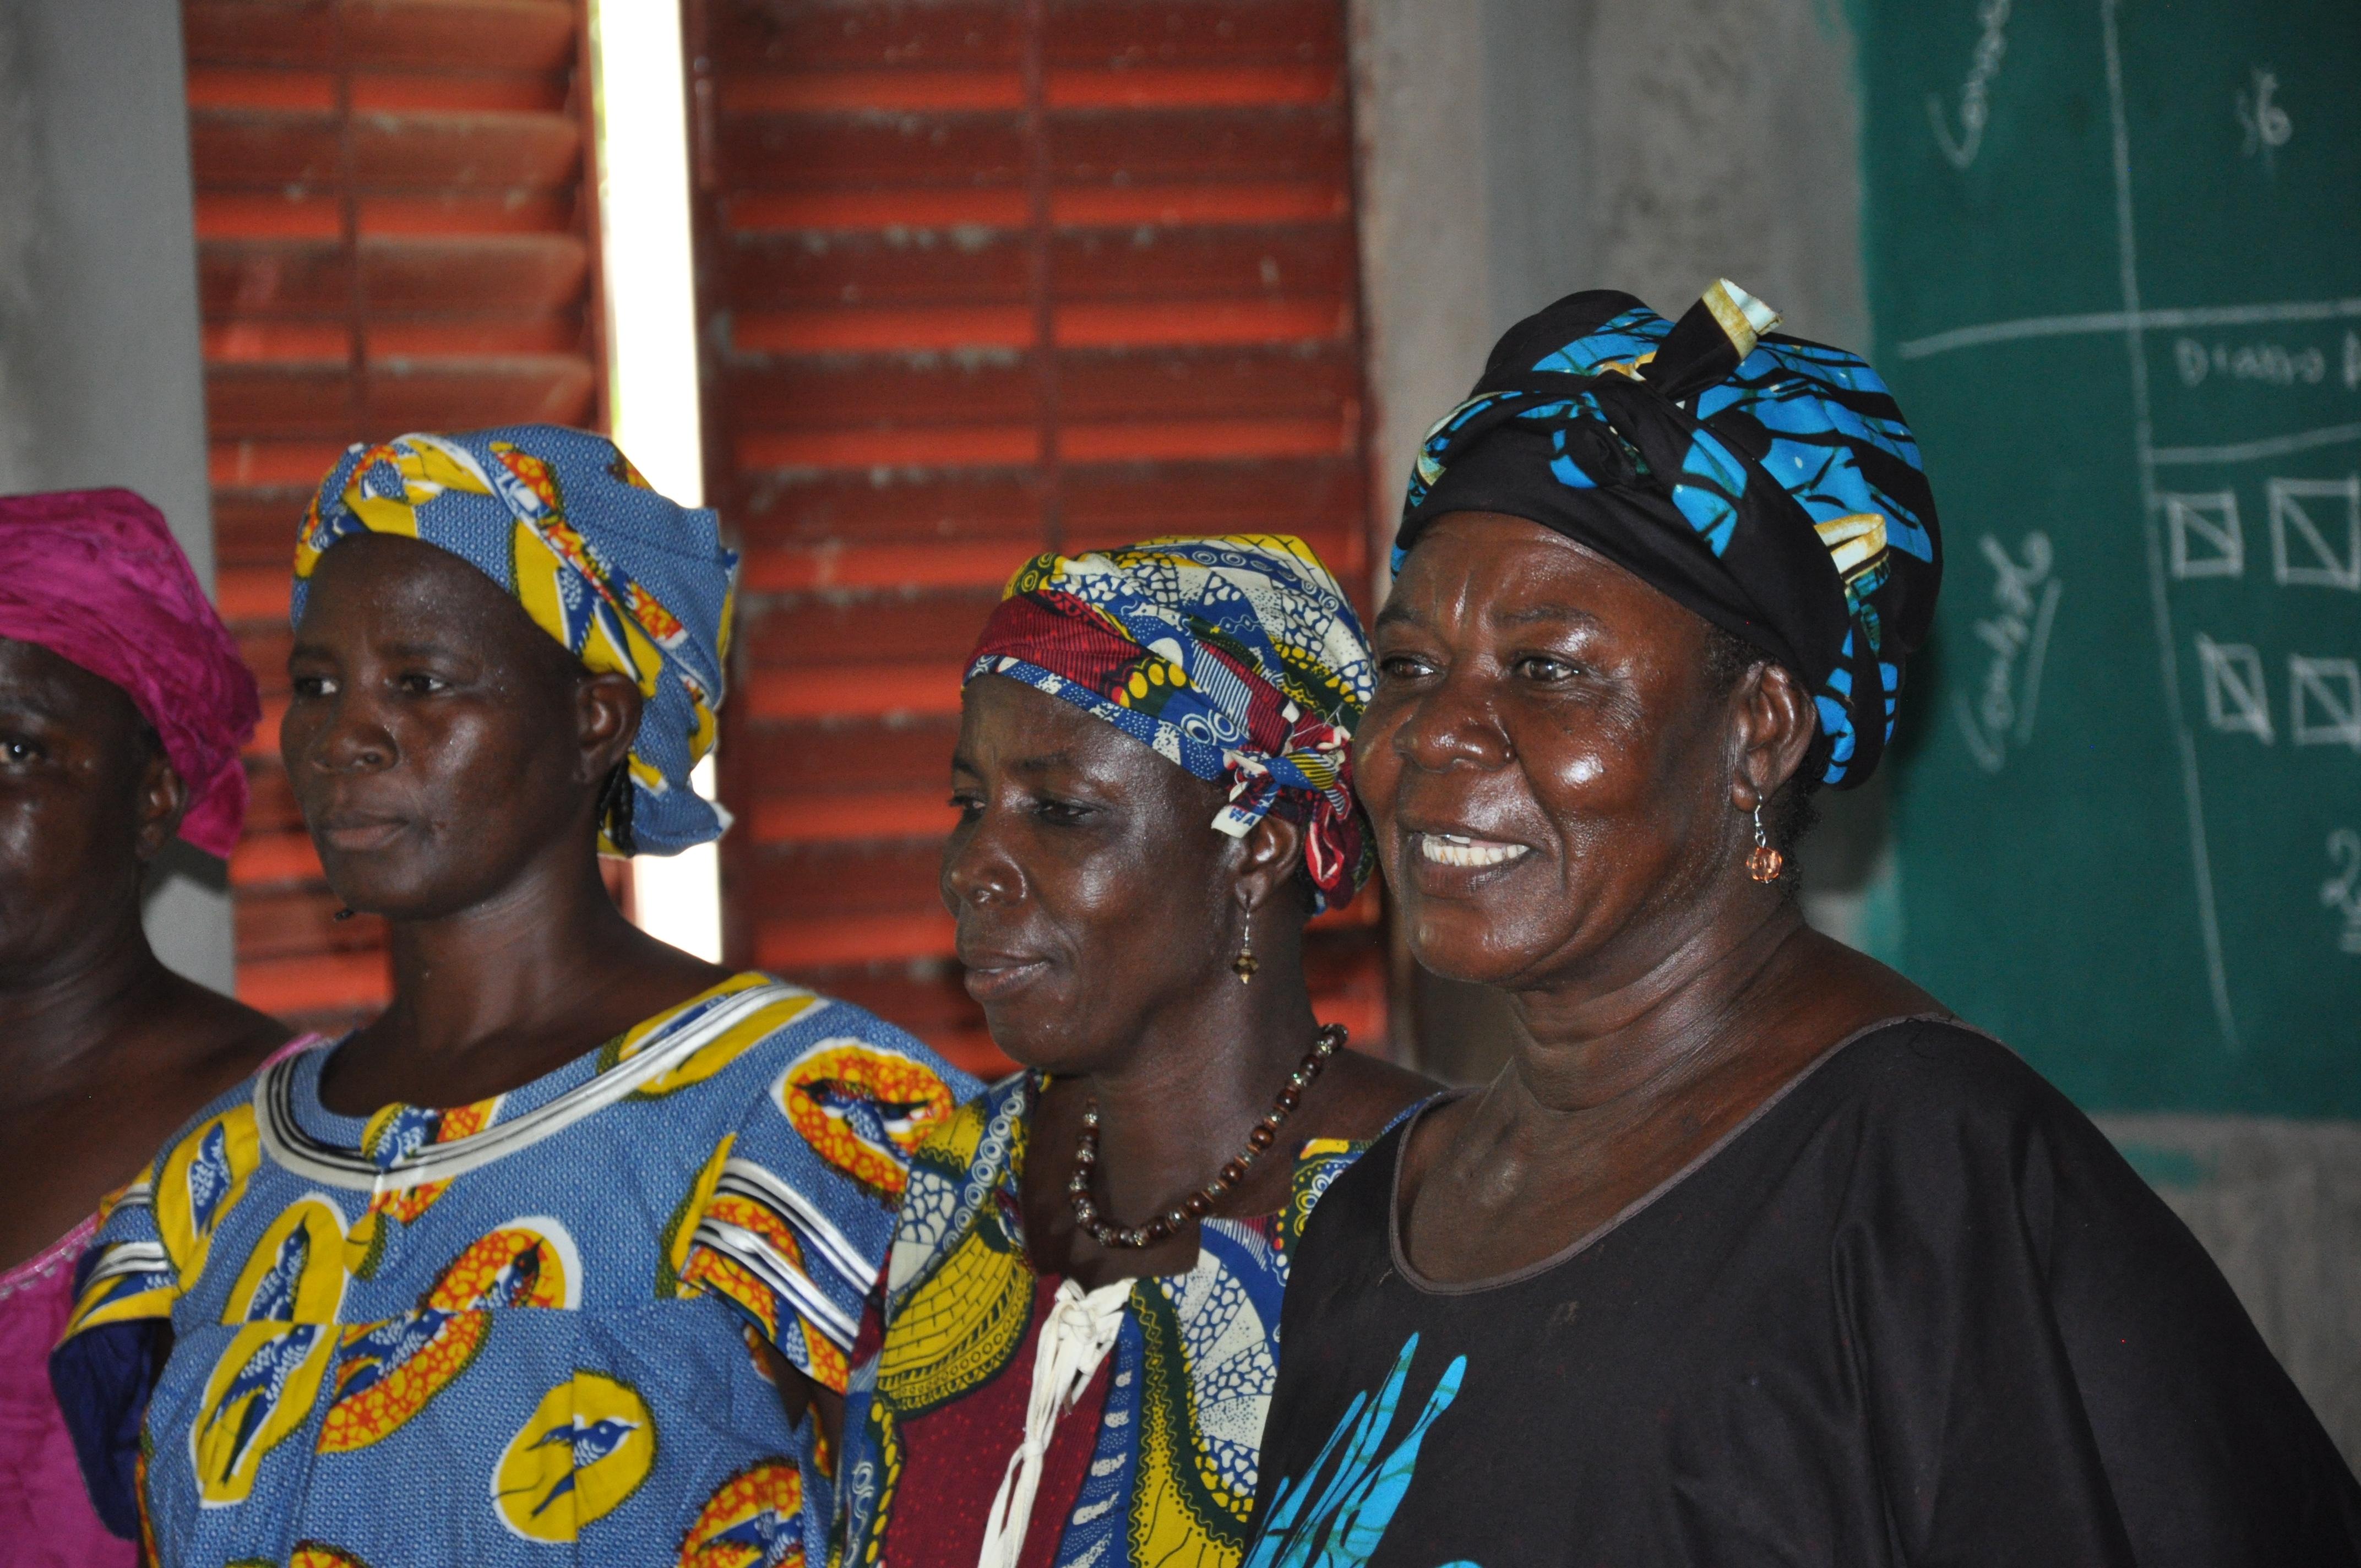 Field Dialogue on ILCF in Burkina Faso